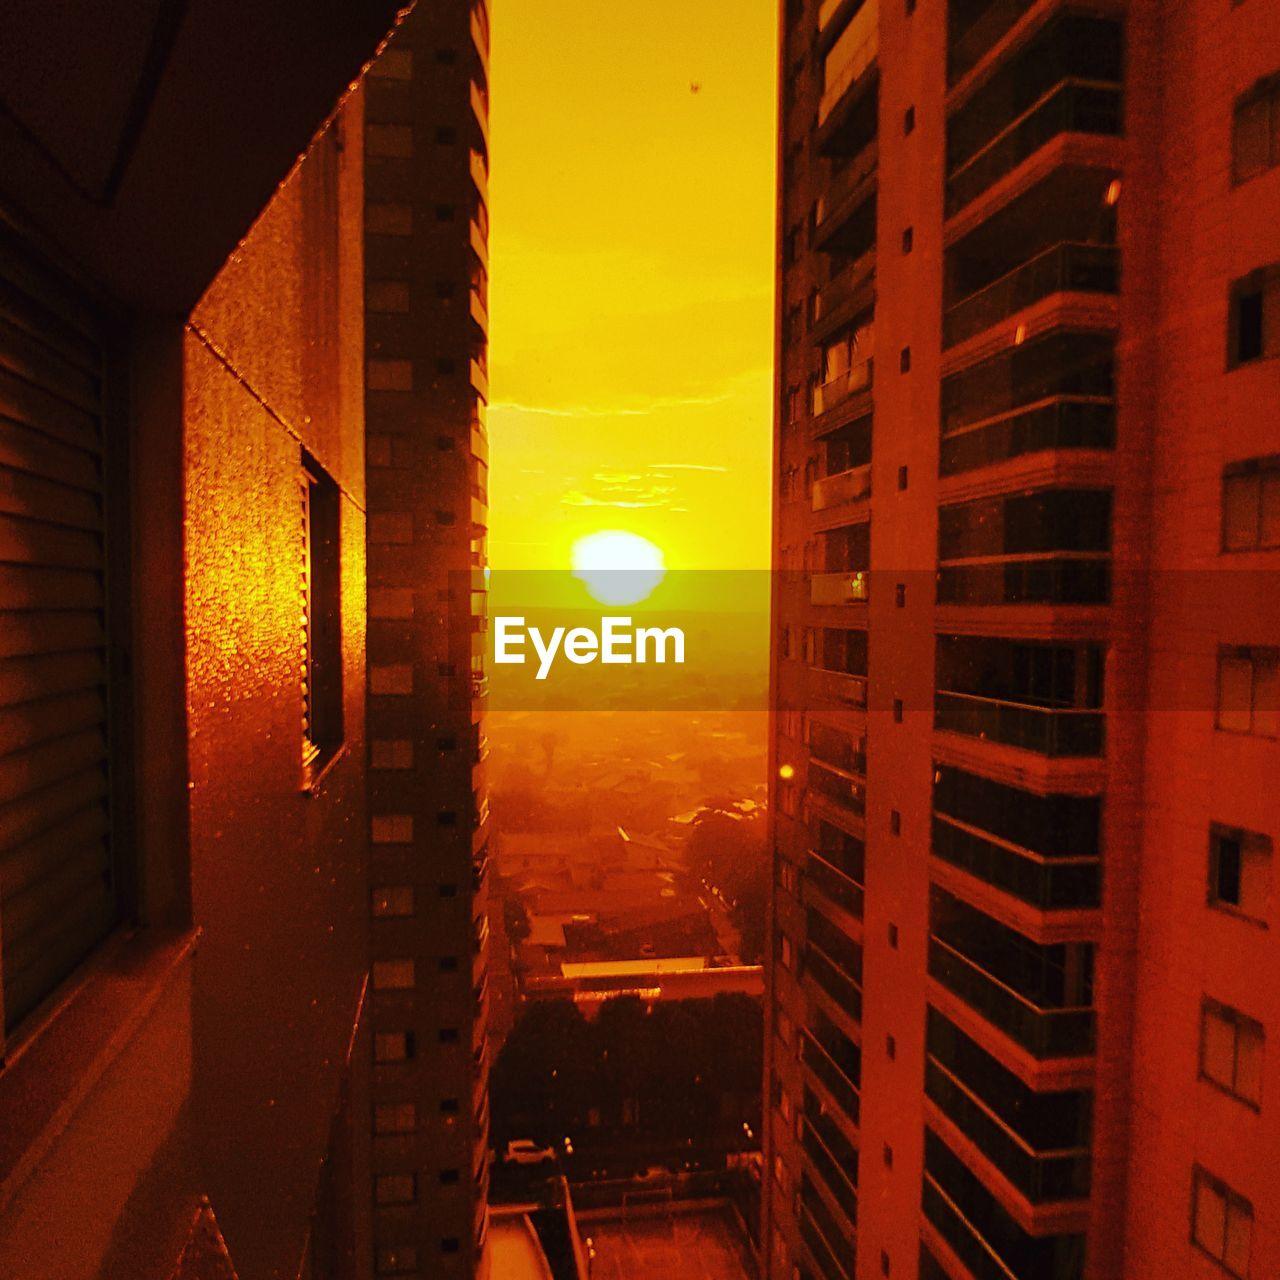 sunset, orange color, architecture, sun, building exterior, built structure, no people, sky, sunlight, outdoors, yellow, scenics, city, nature